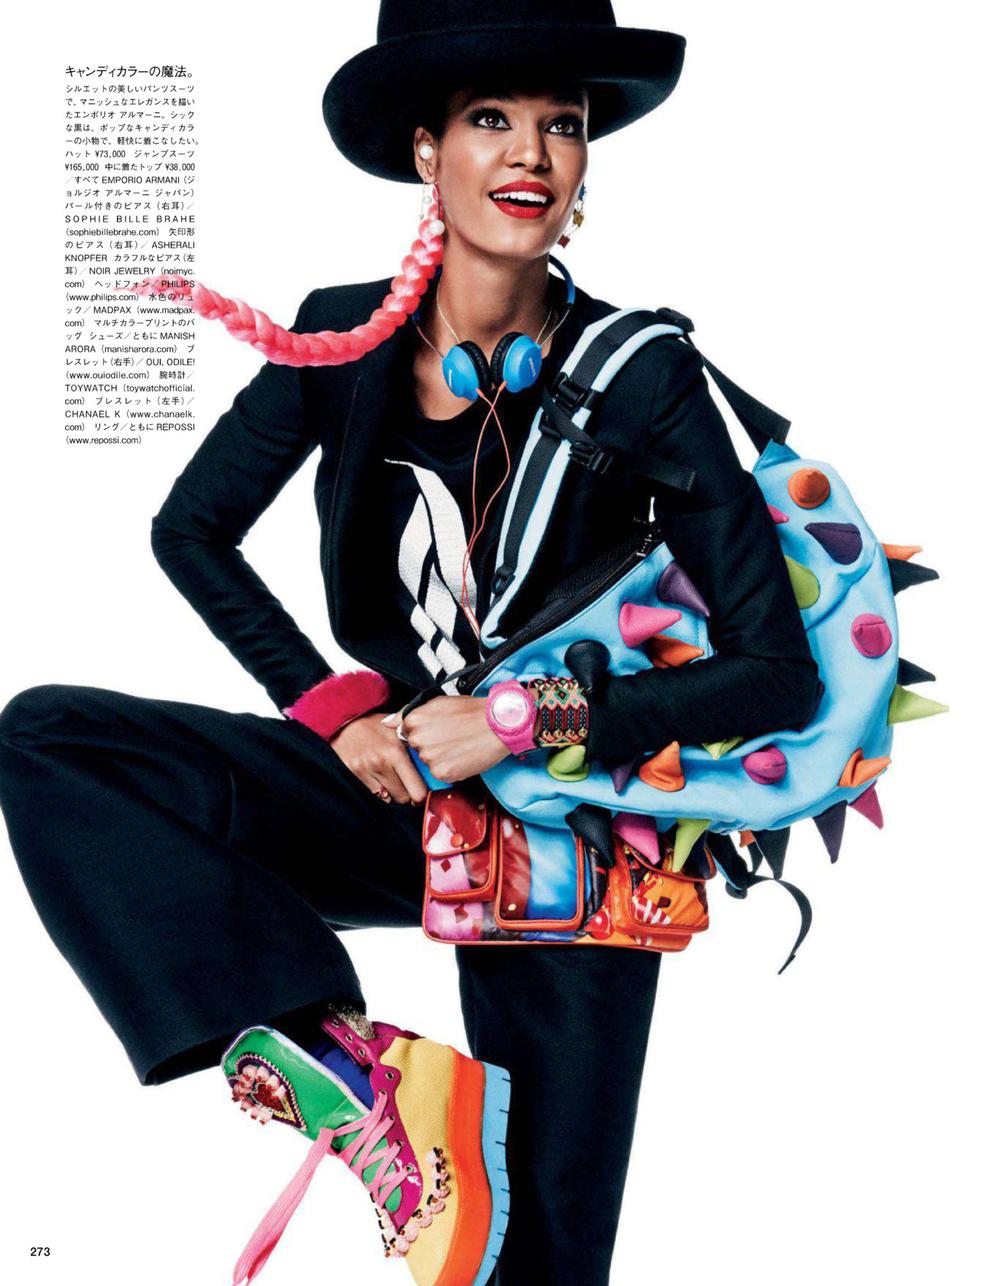 Giampaolo-Sgura-Joan-Smalls-Vogue-Japan-December-2014-8.jpg